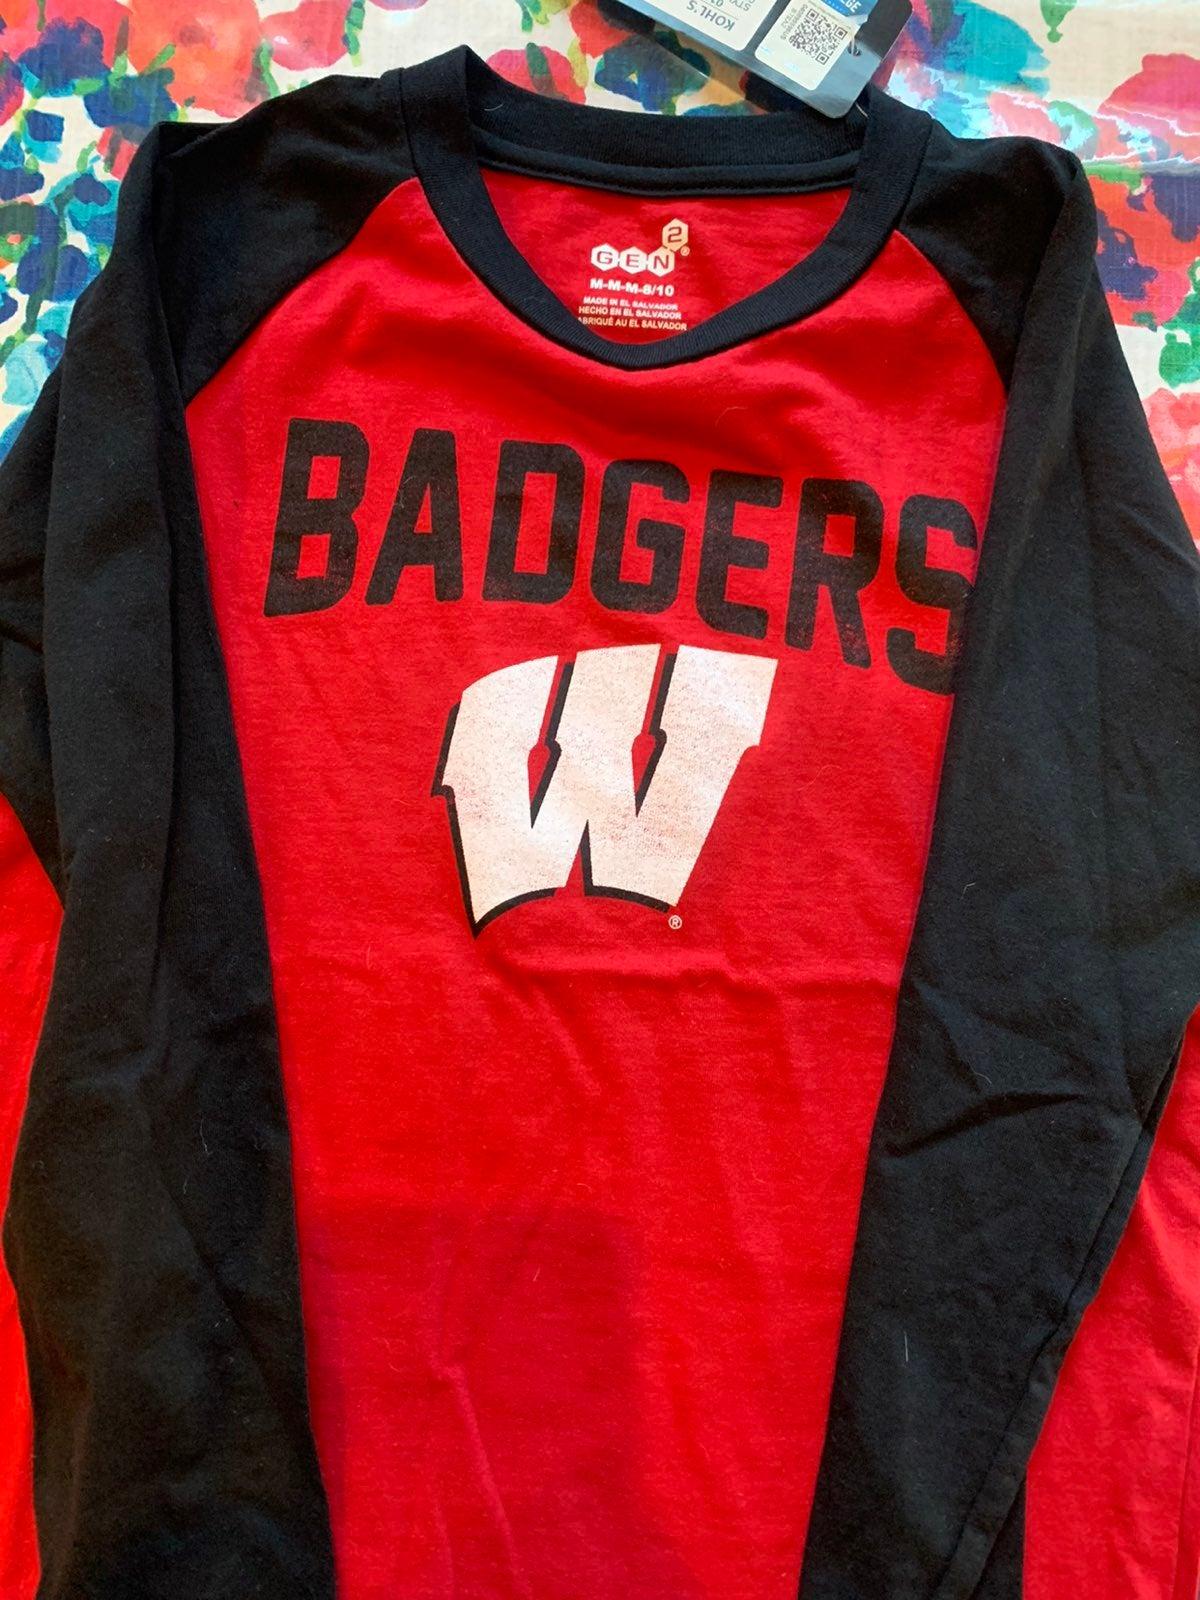 Kids Wisconsin Badgers shirt